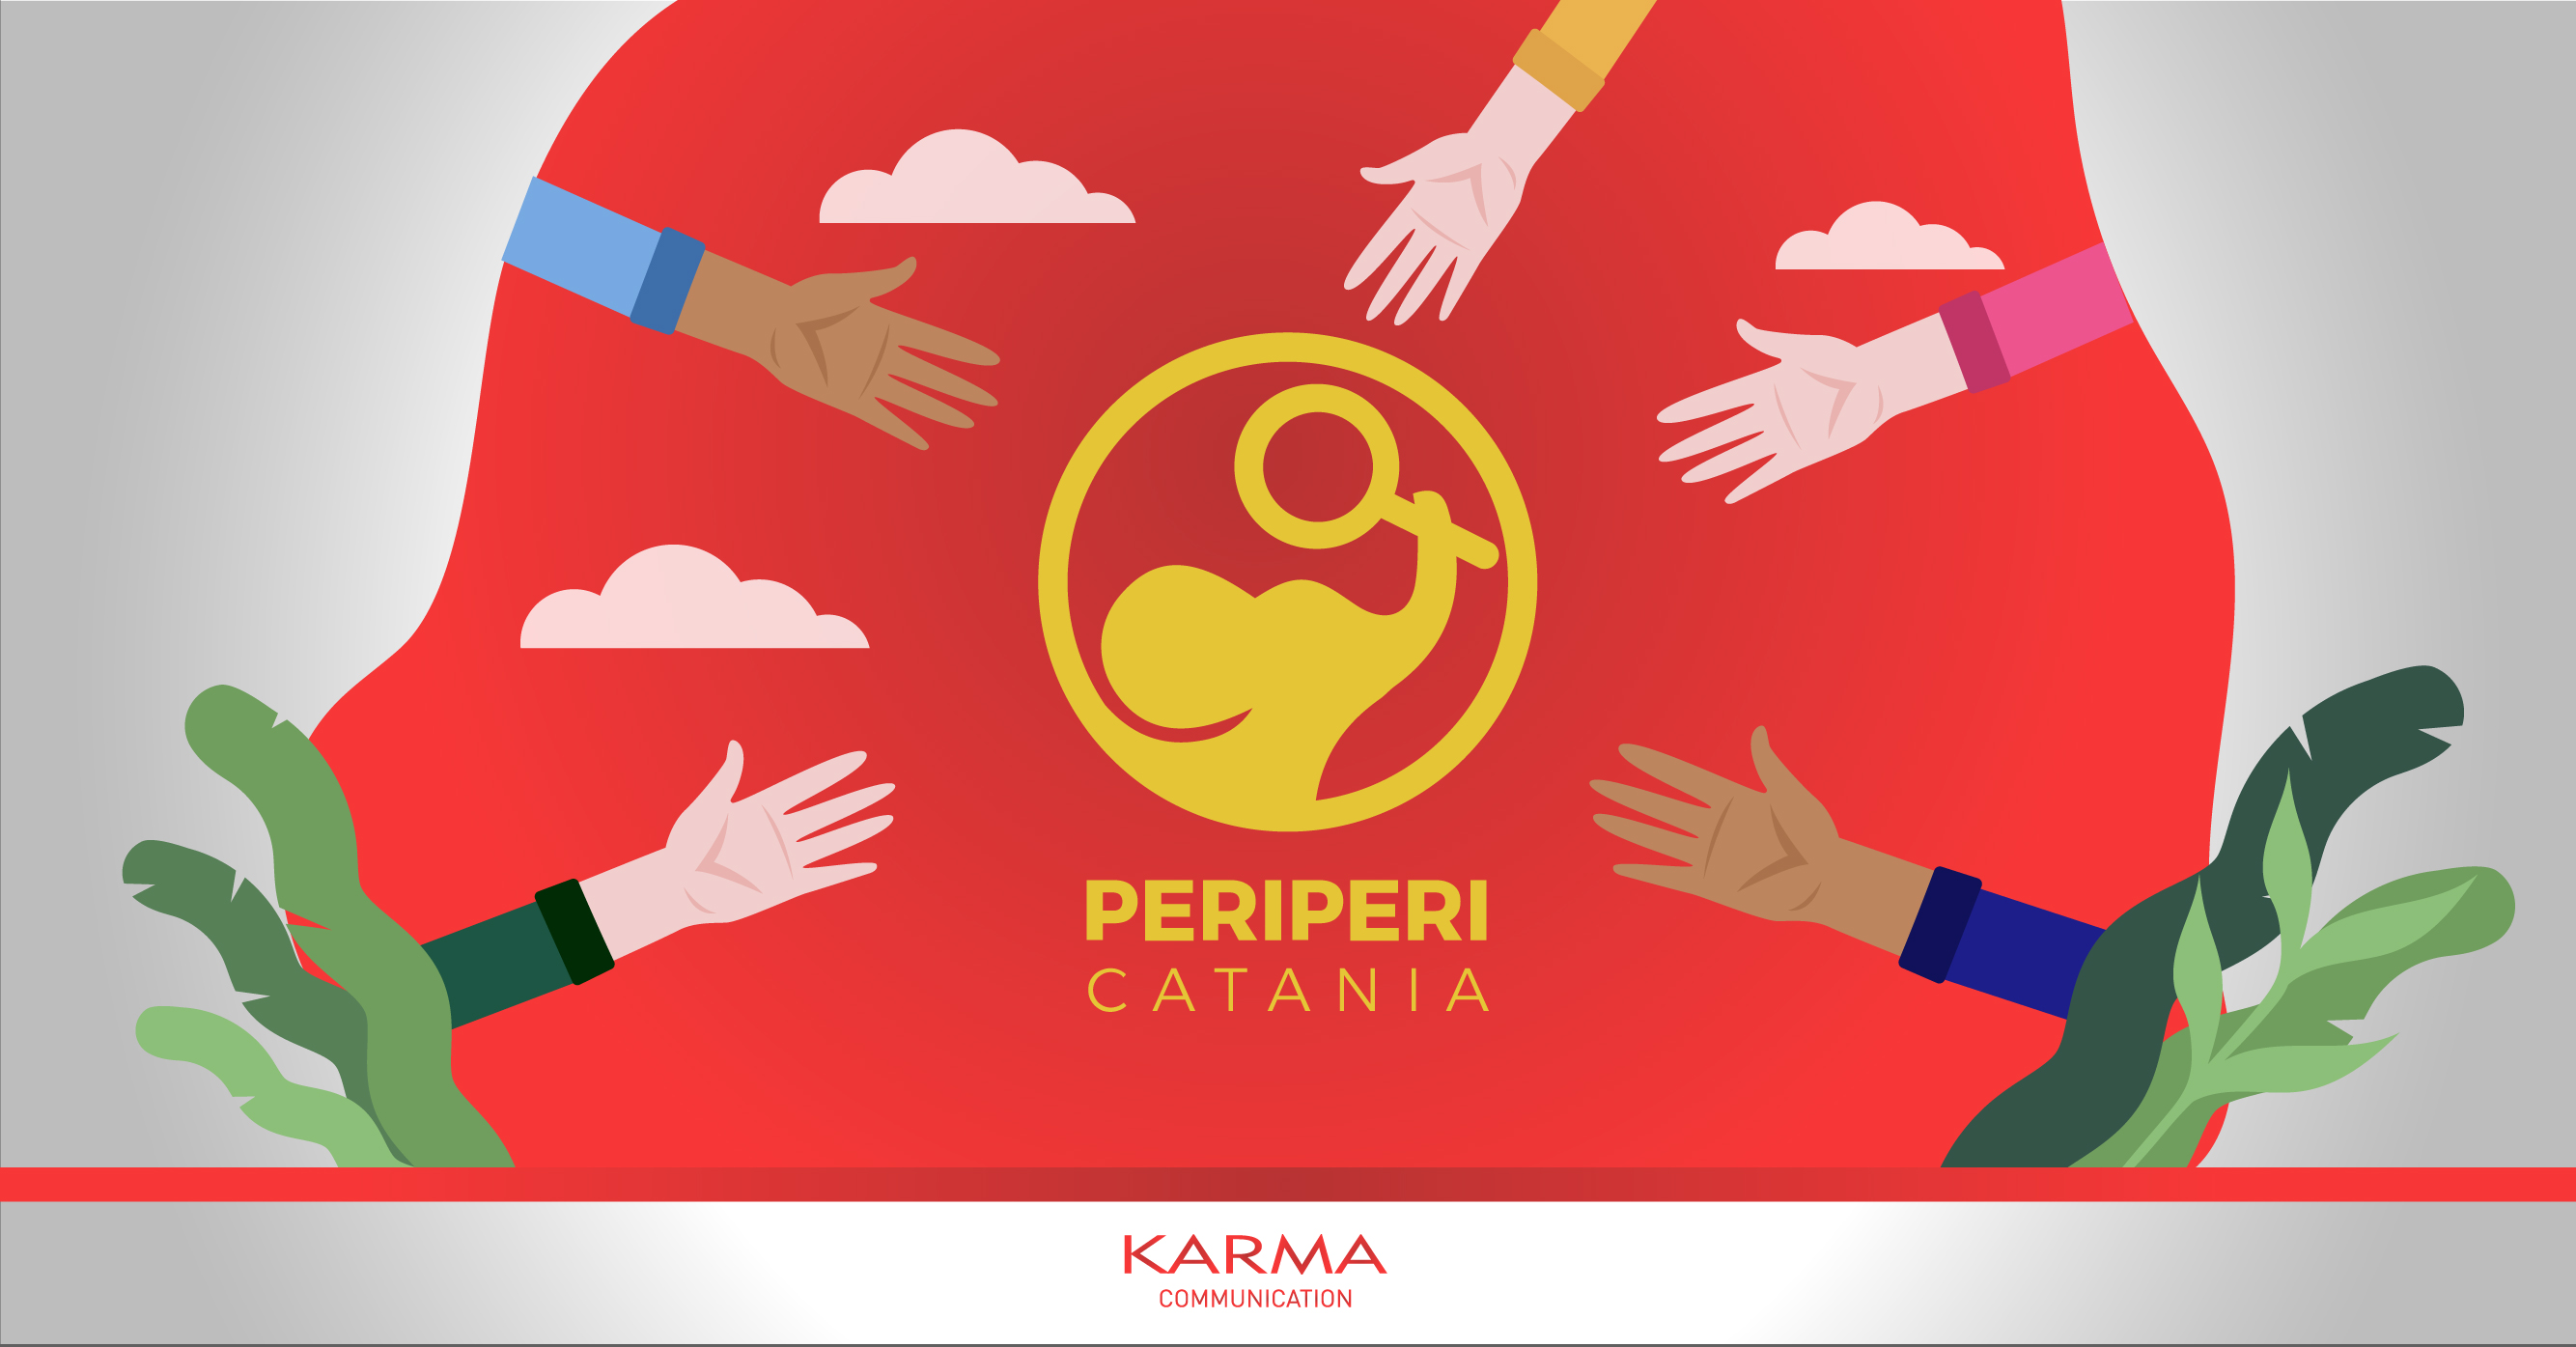 Karma Communication - PeriPeri Catania è il surplus di questa agenzia di comunicazione